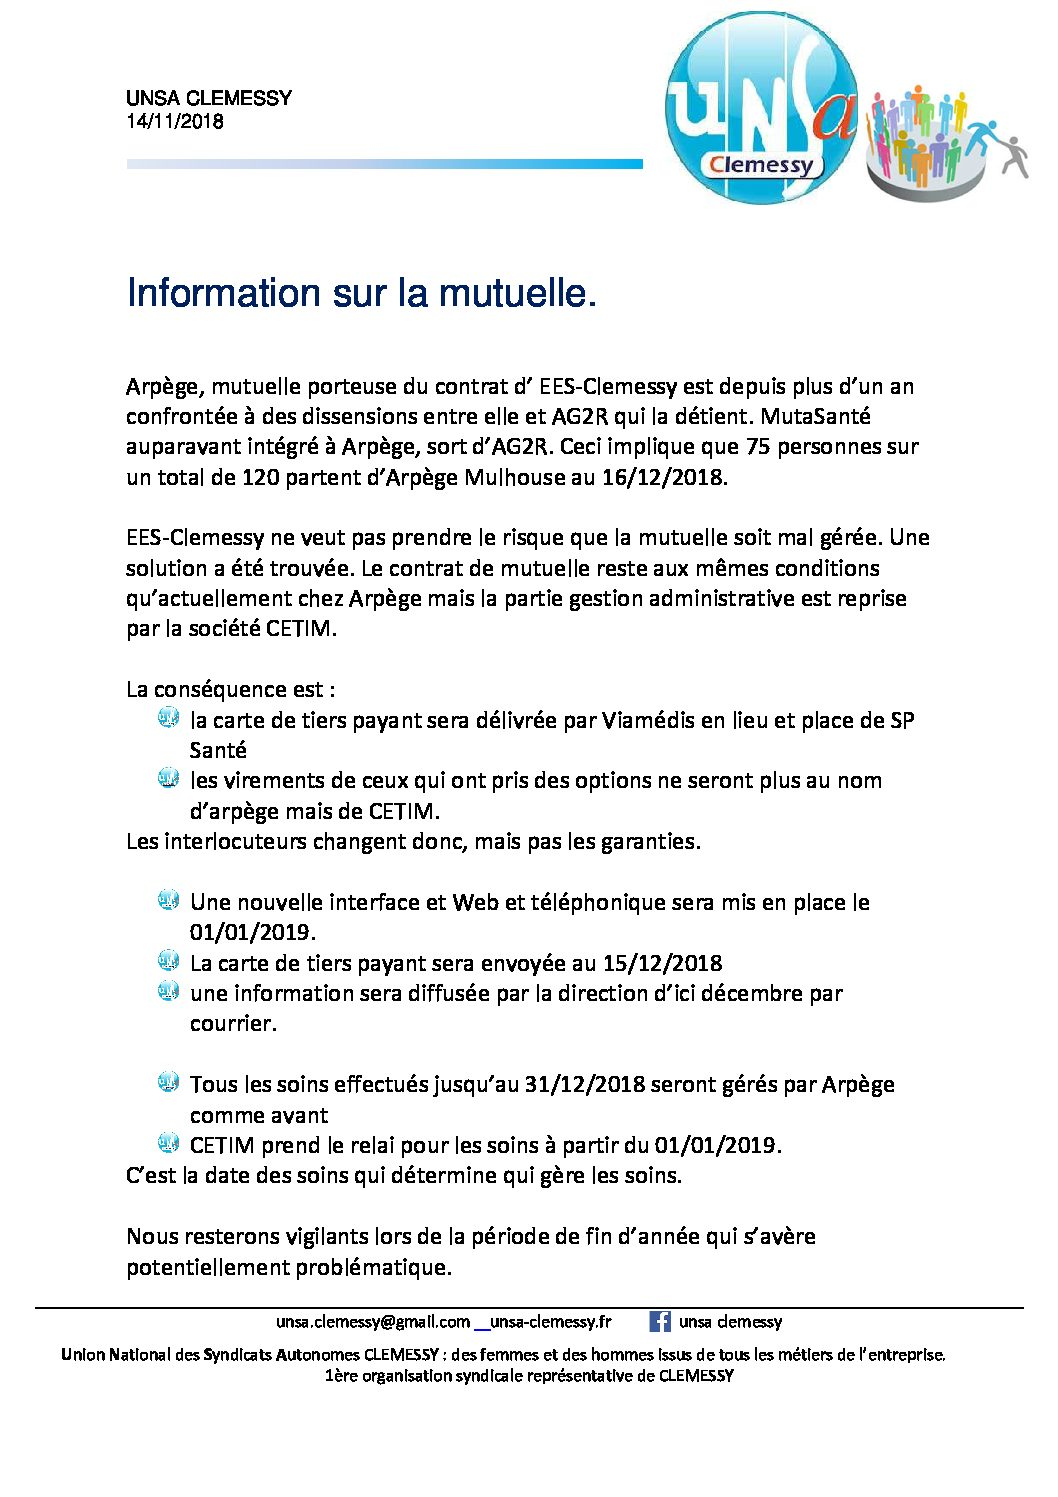 2018_11_15_compte-rendu réunion info mutuelle